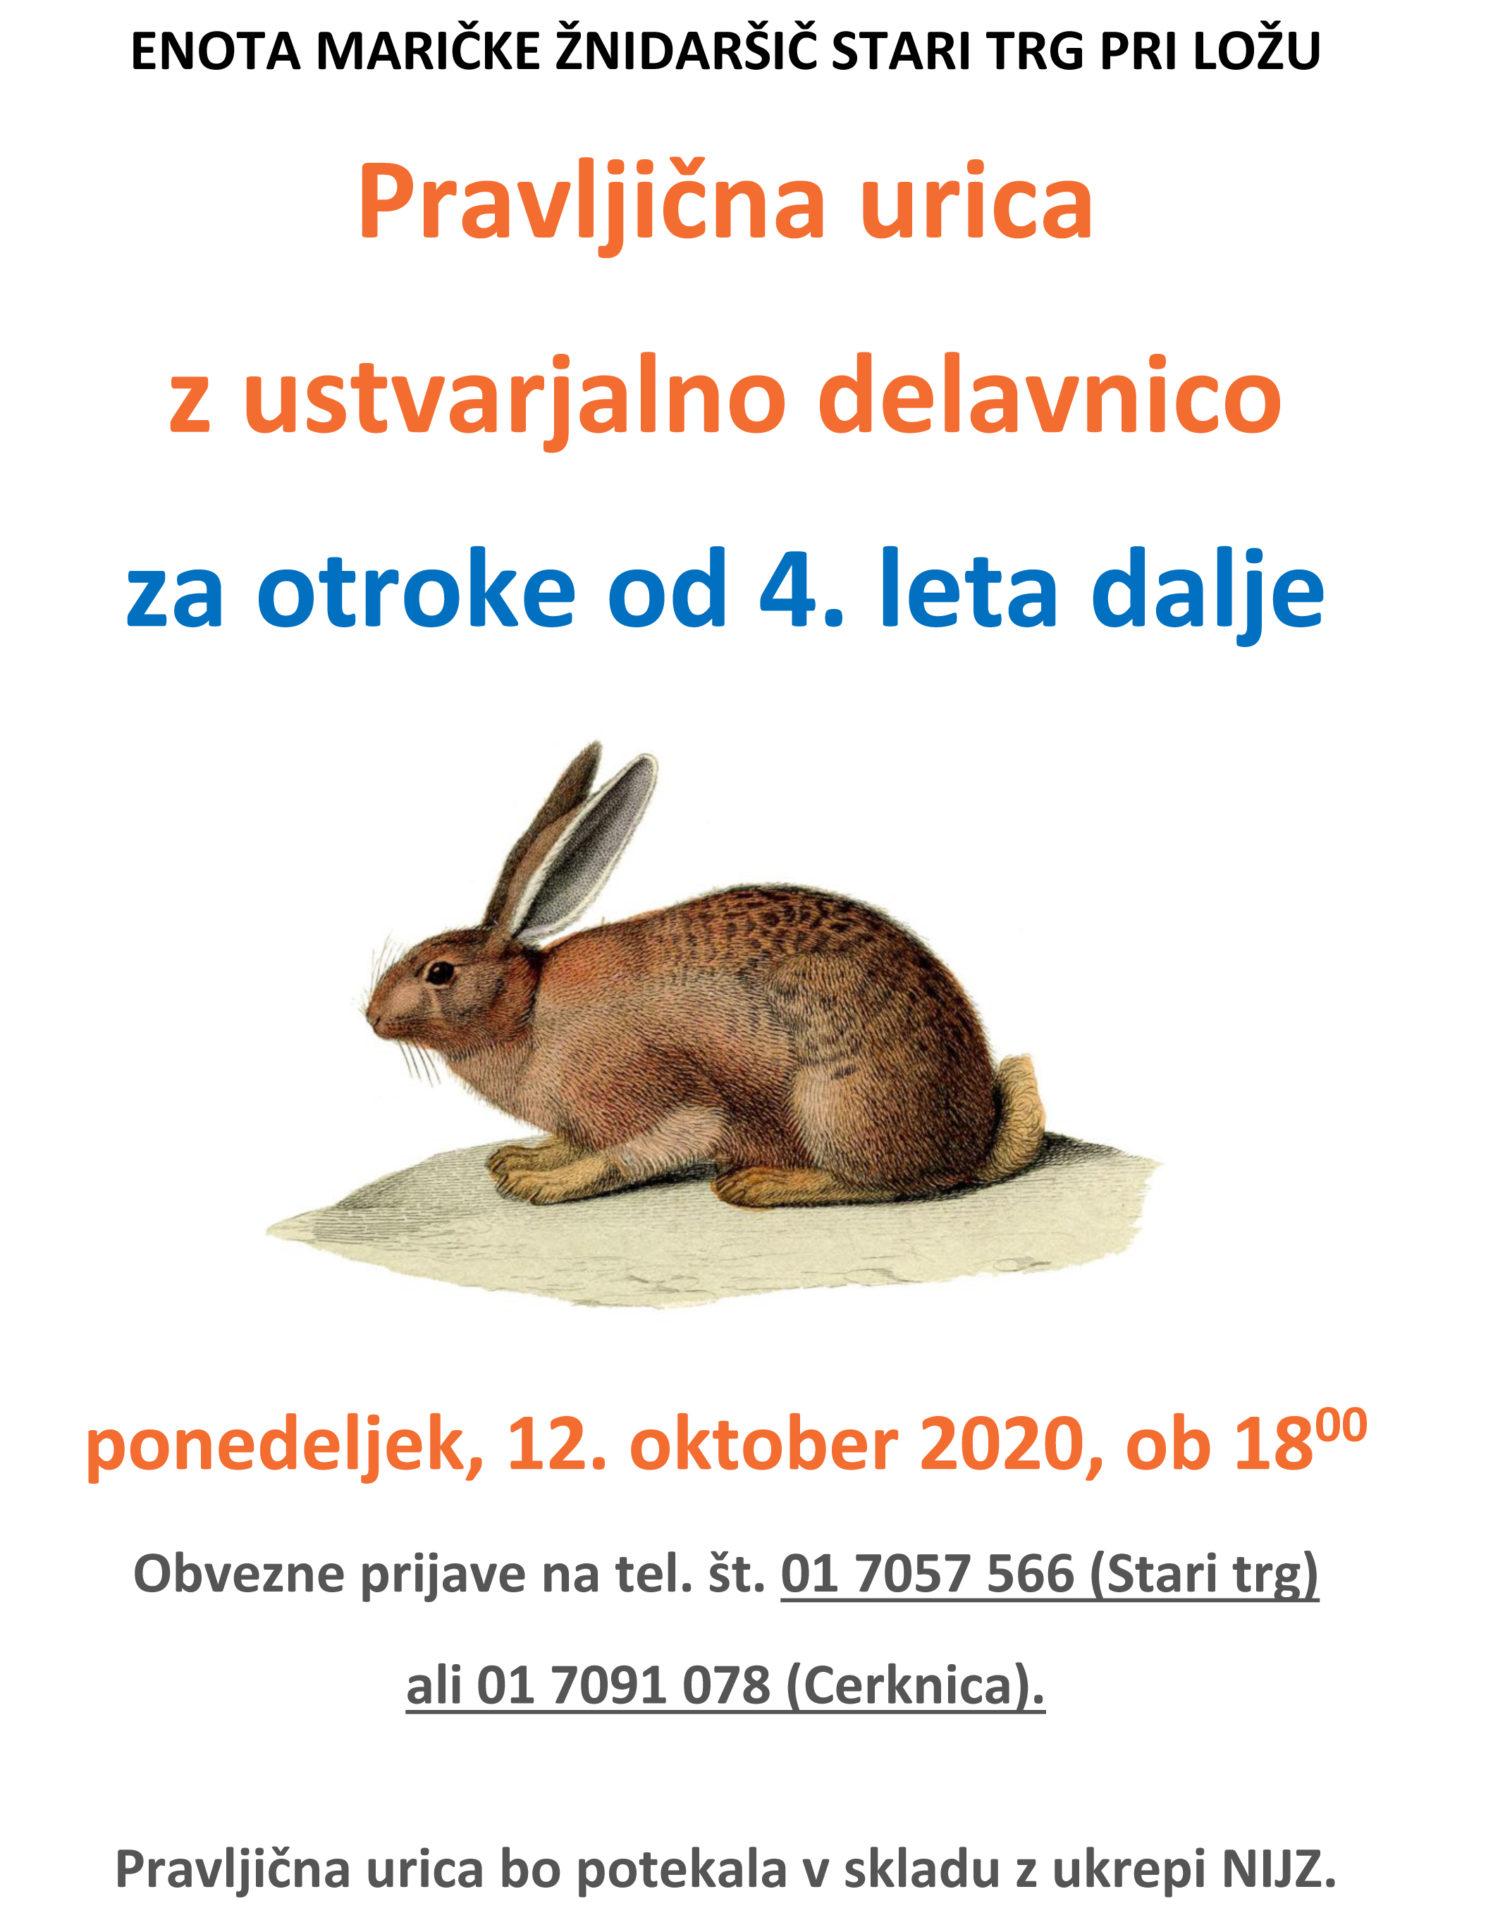 st pravljicna okt2020 - Dogodki